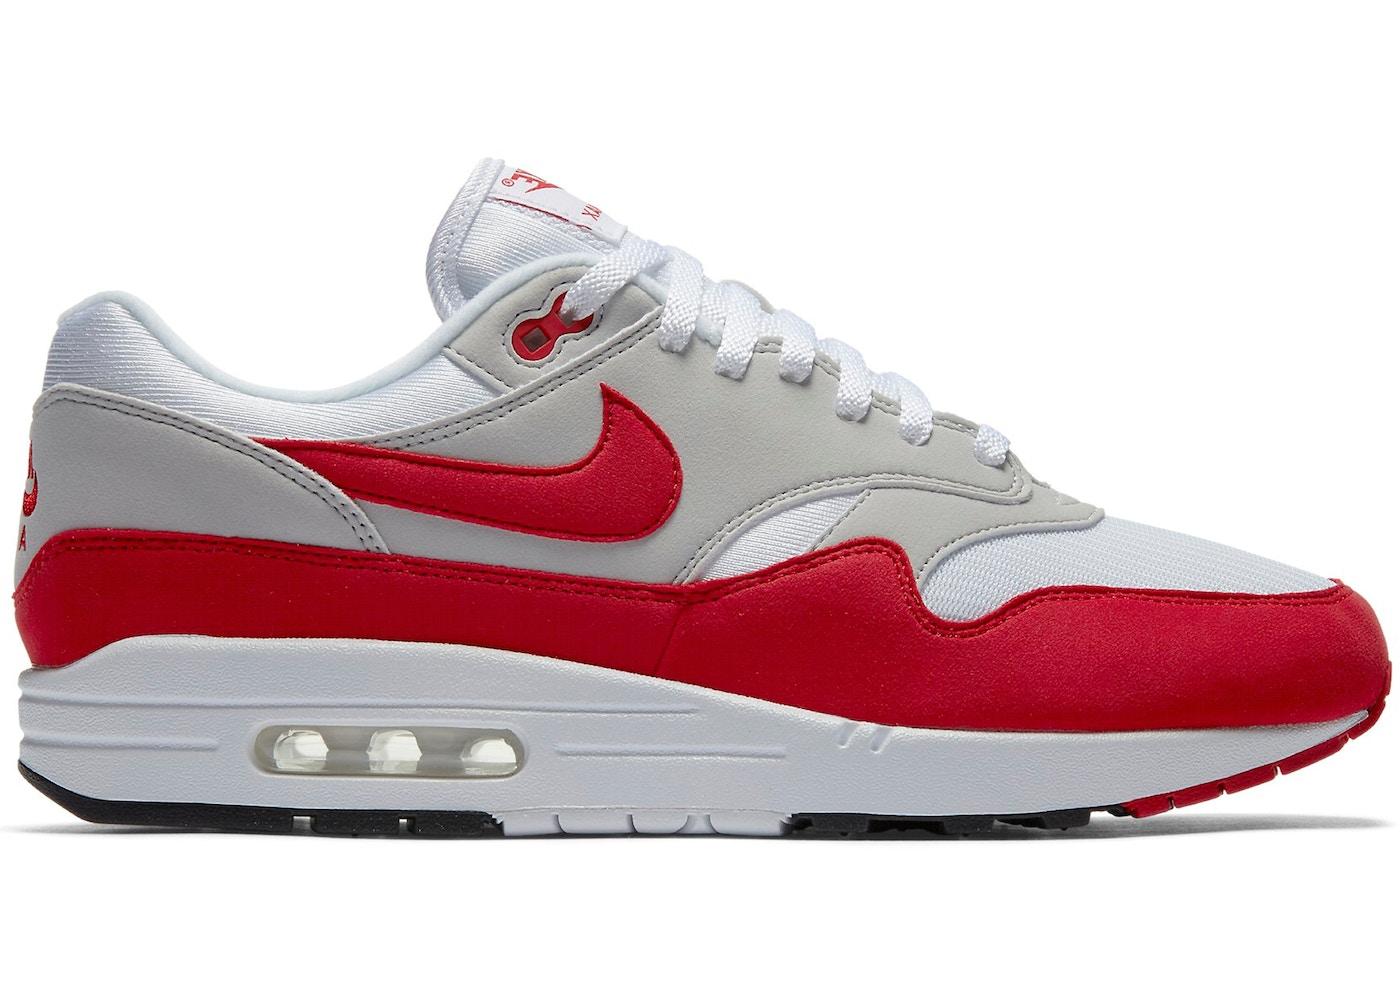 720183eab30 Sneakers Size 12 - Volatility